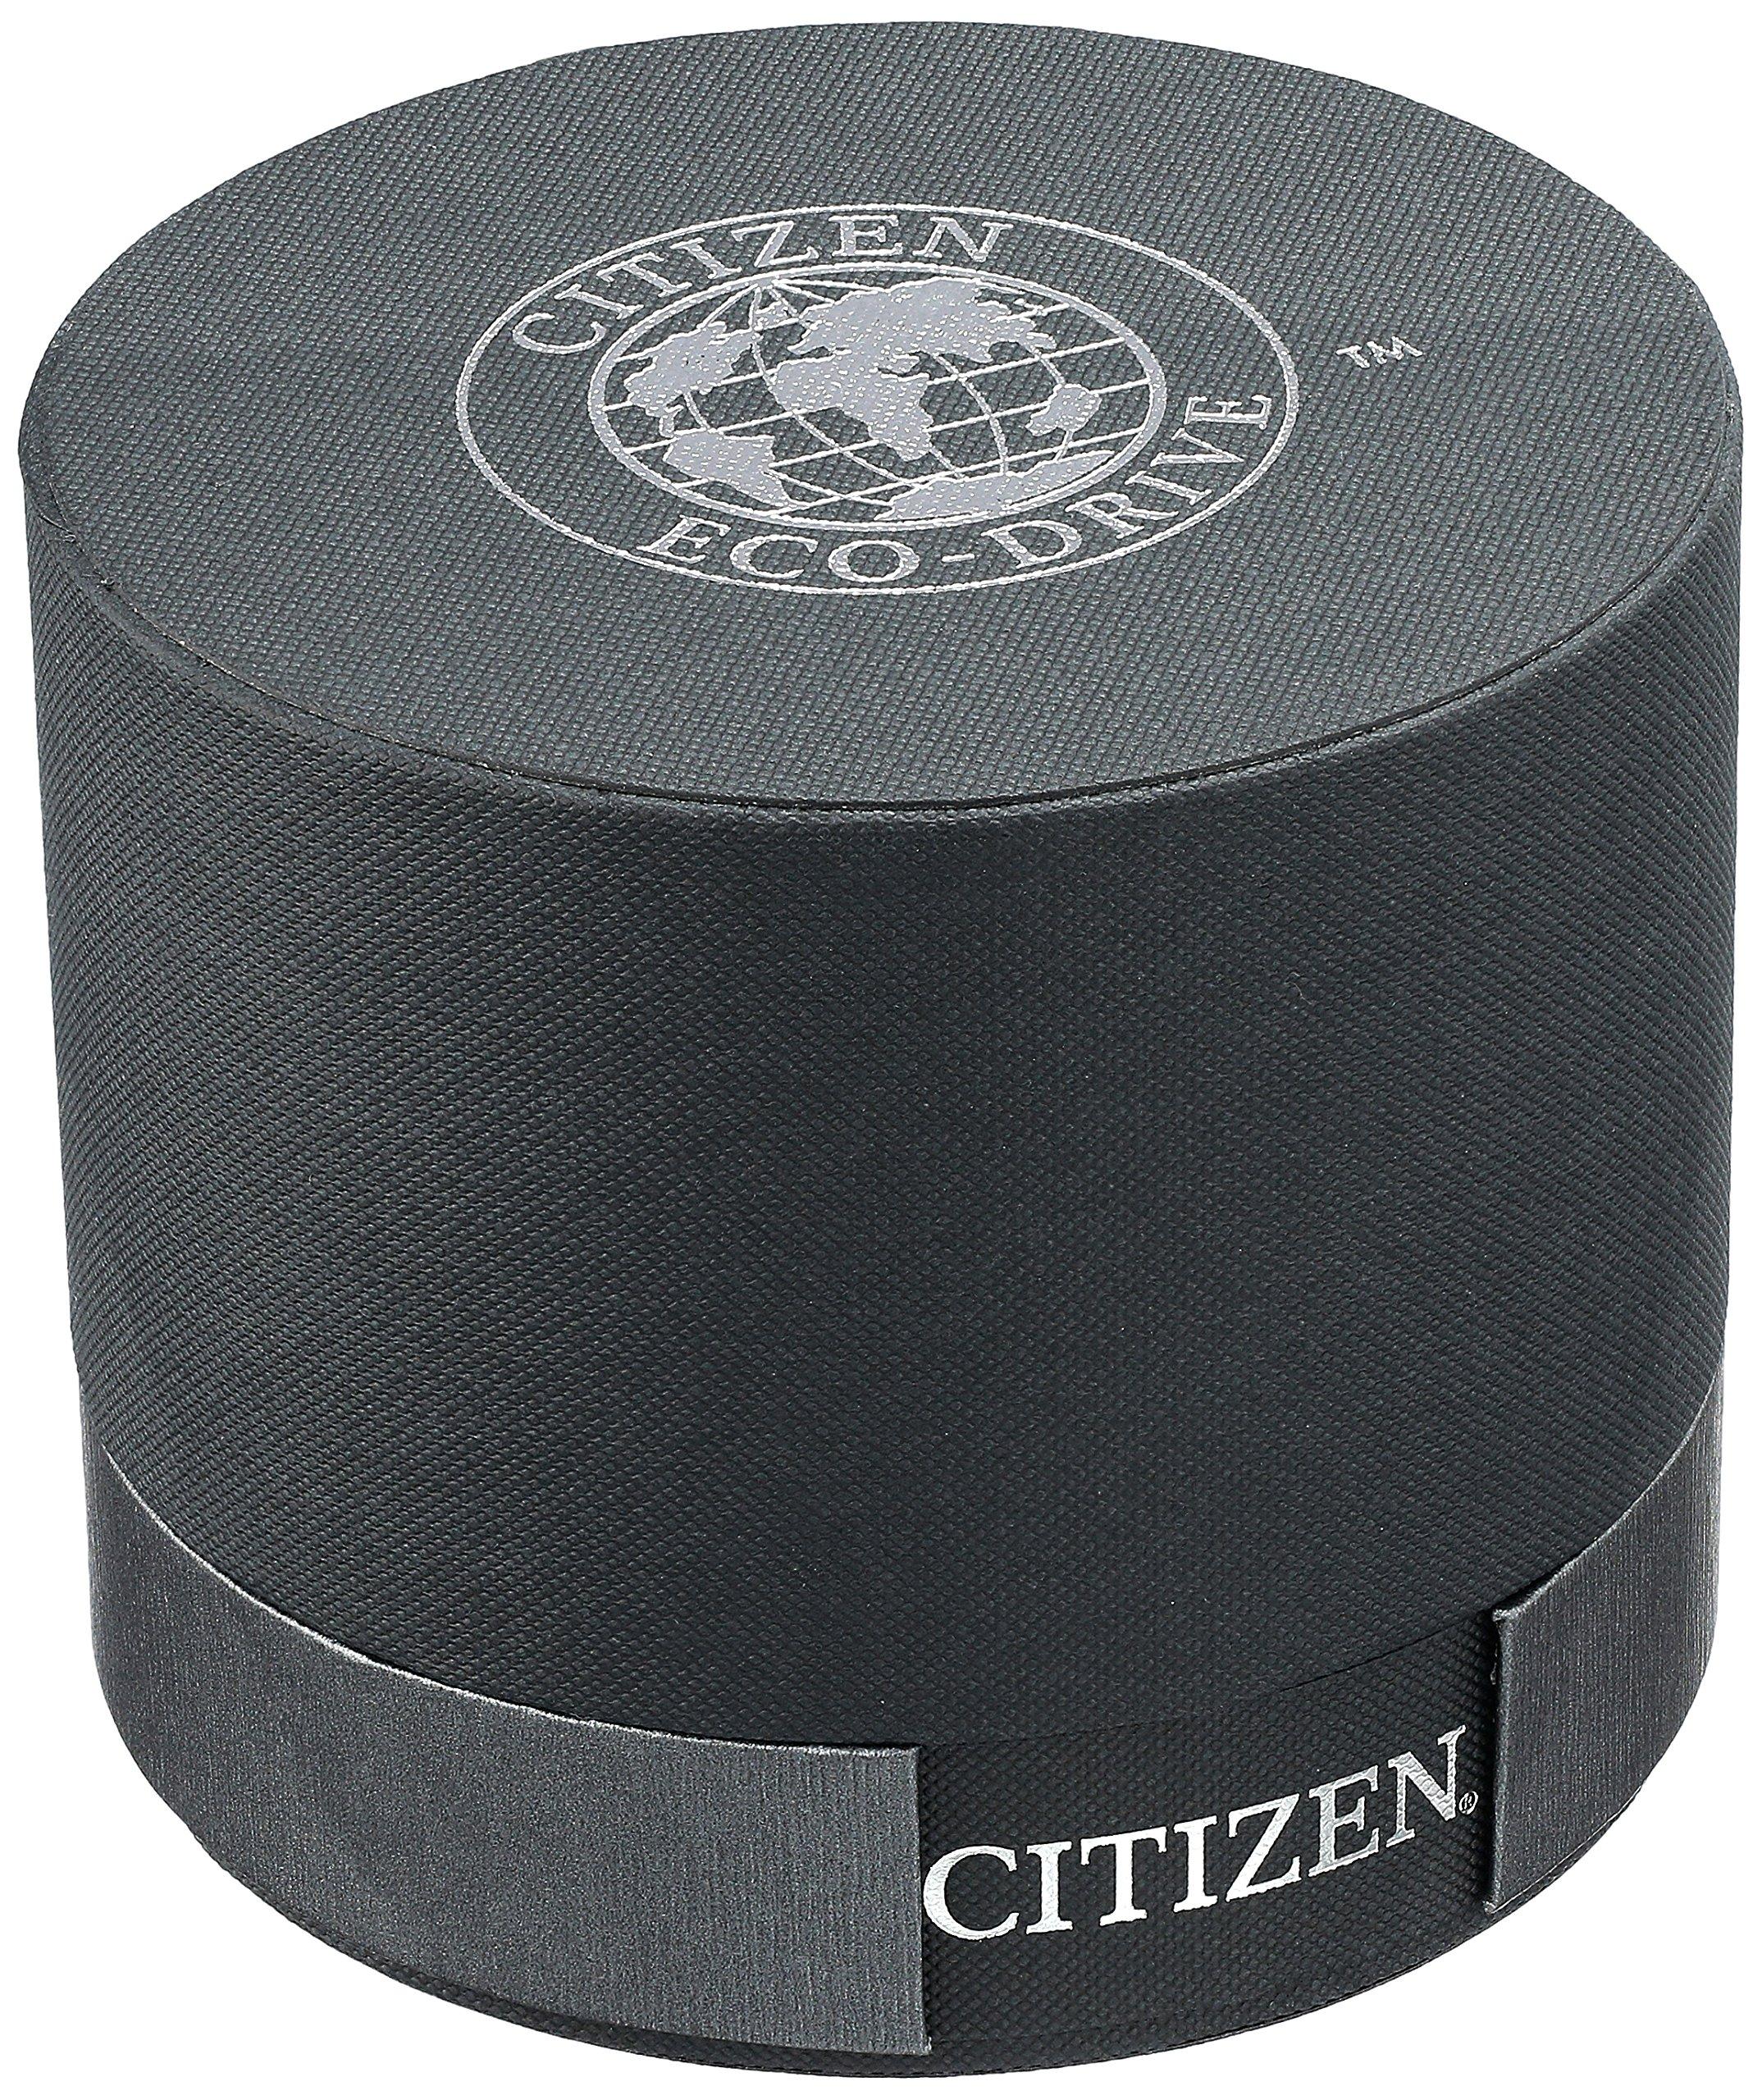 Citizen Women's EW3144-51A Eco-Drive Sport Two-Tone Watch by Citizen (Image #5)